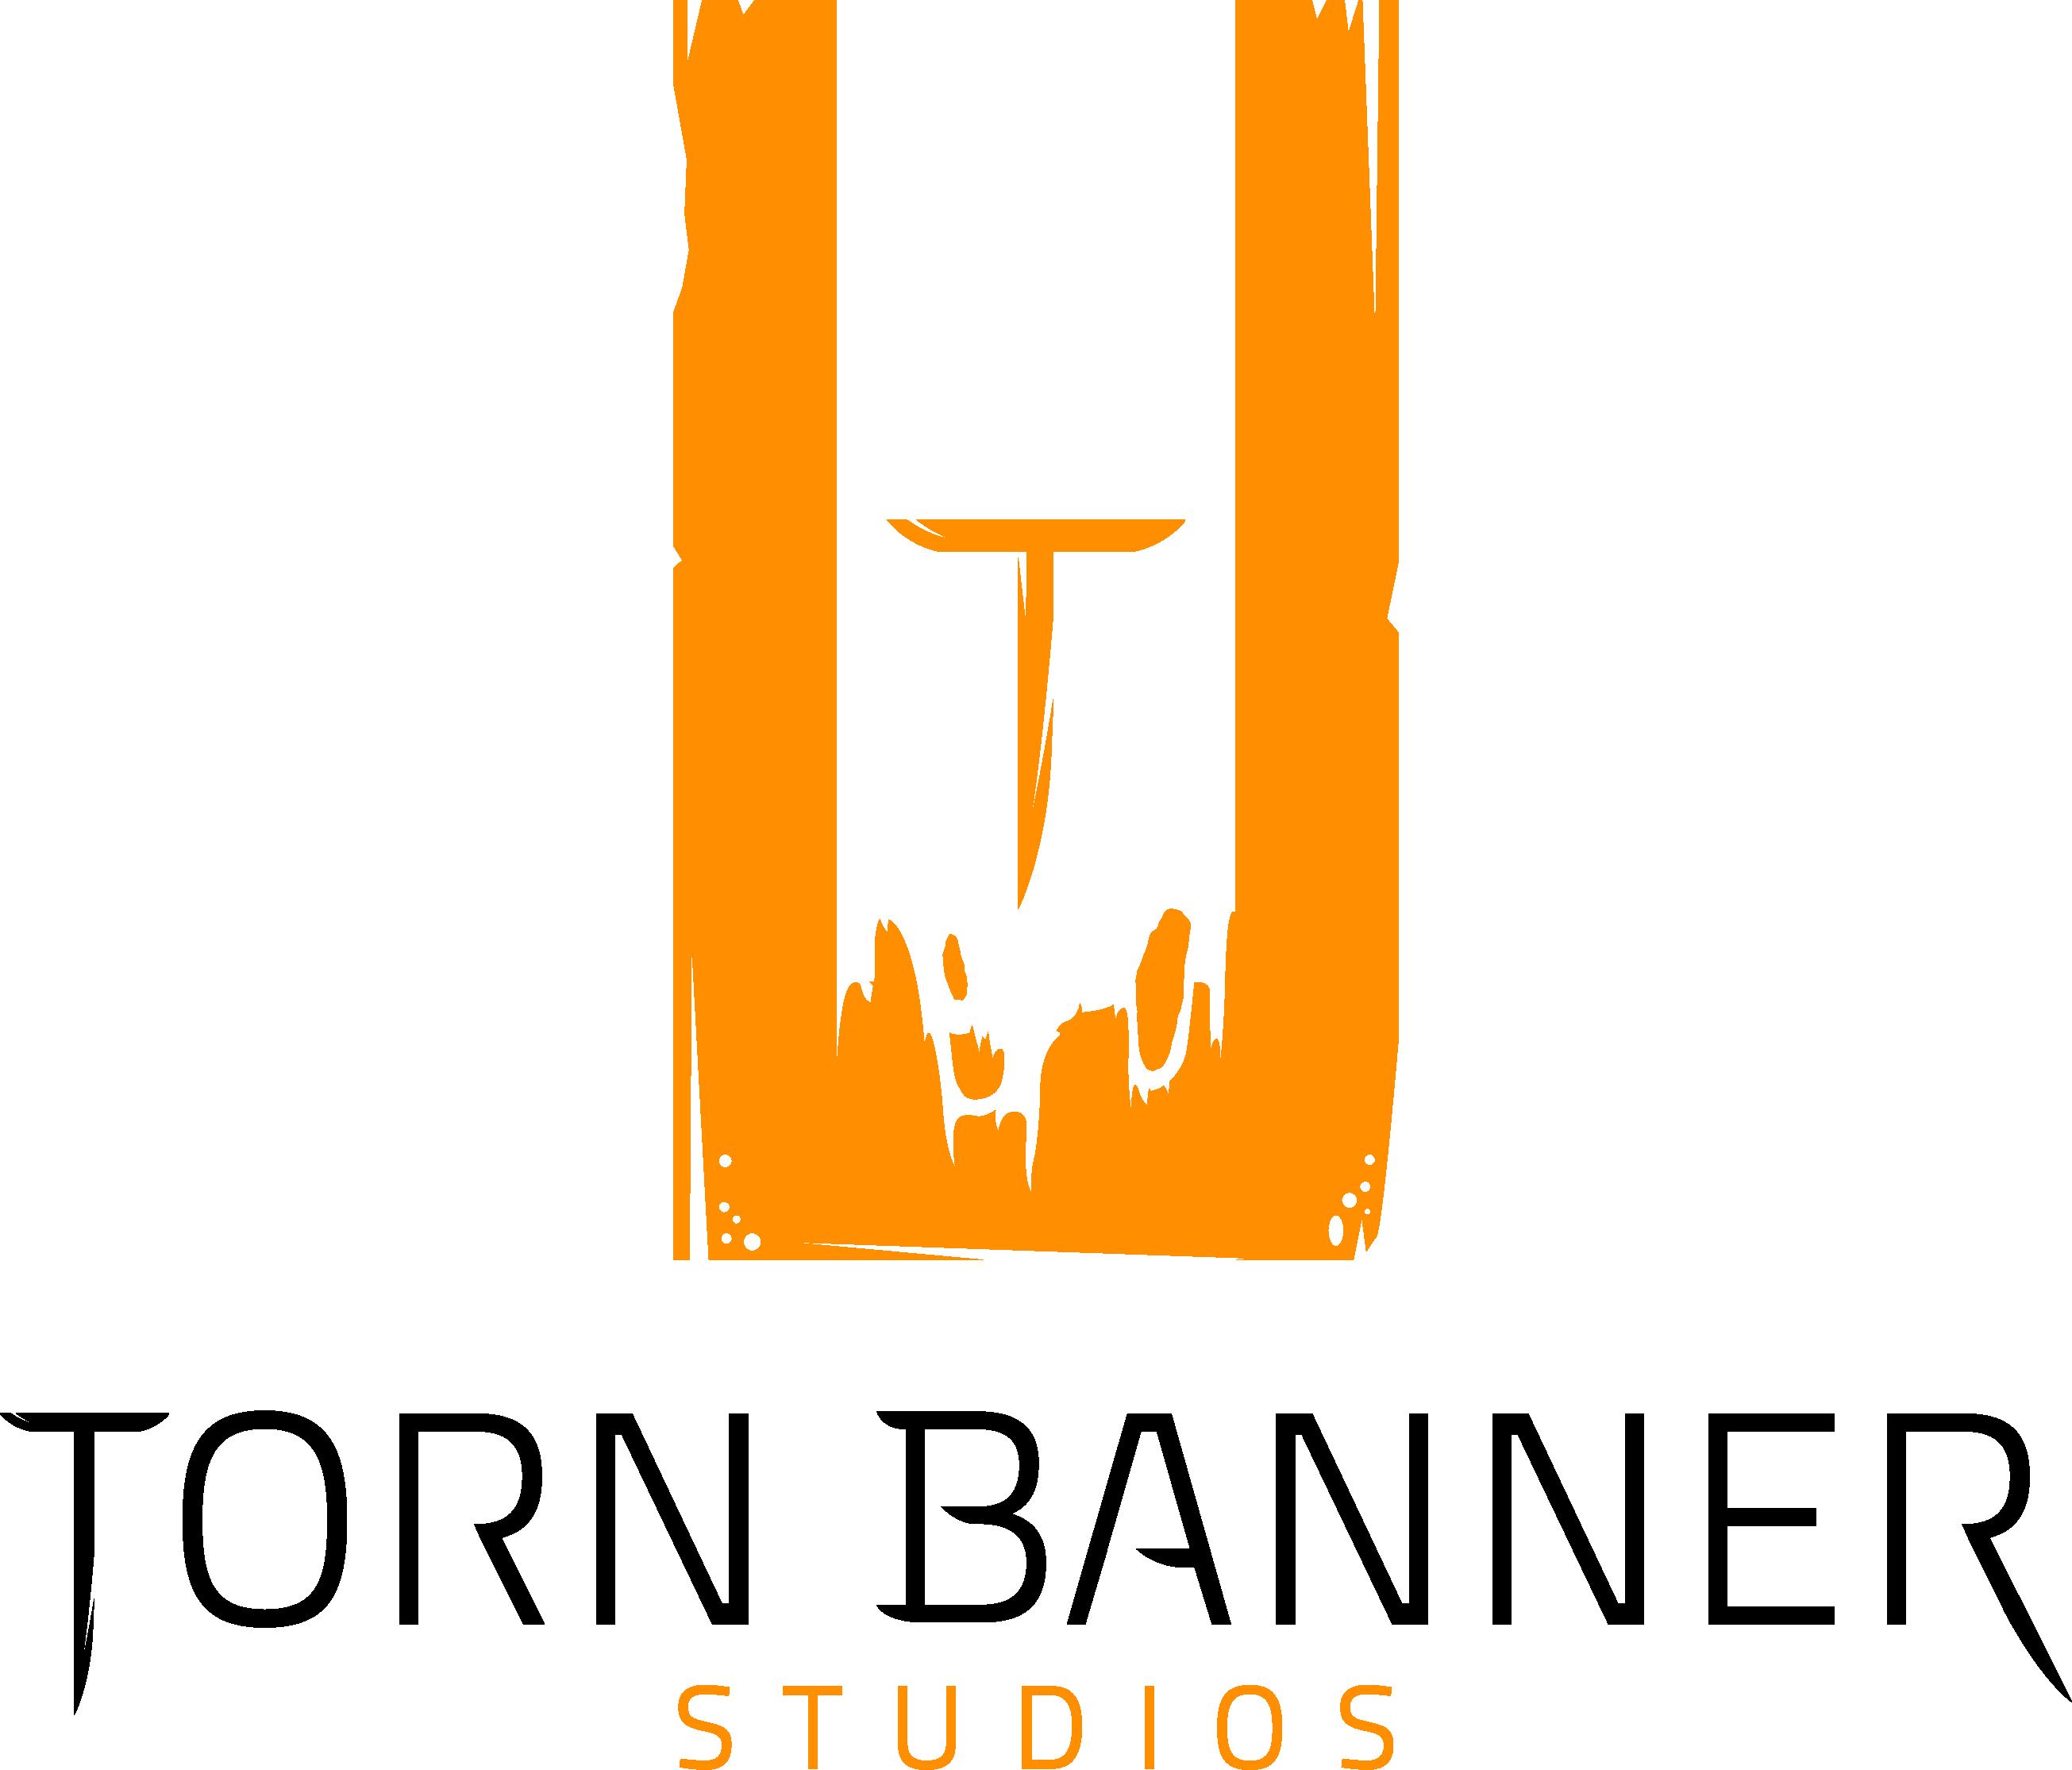 Torn Banner Studios